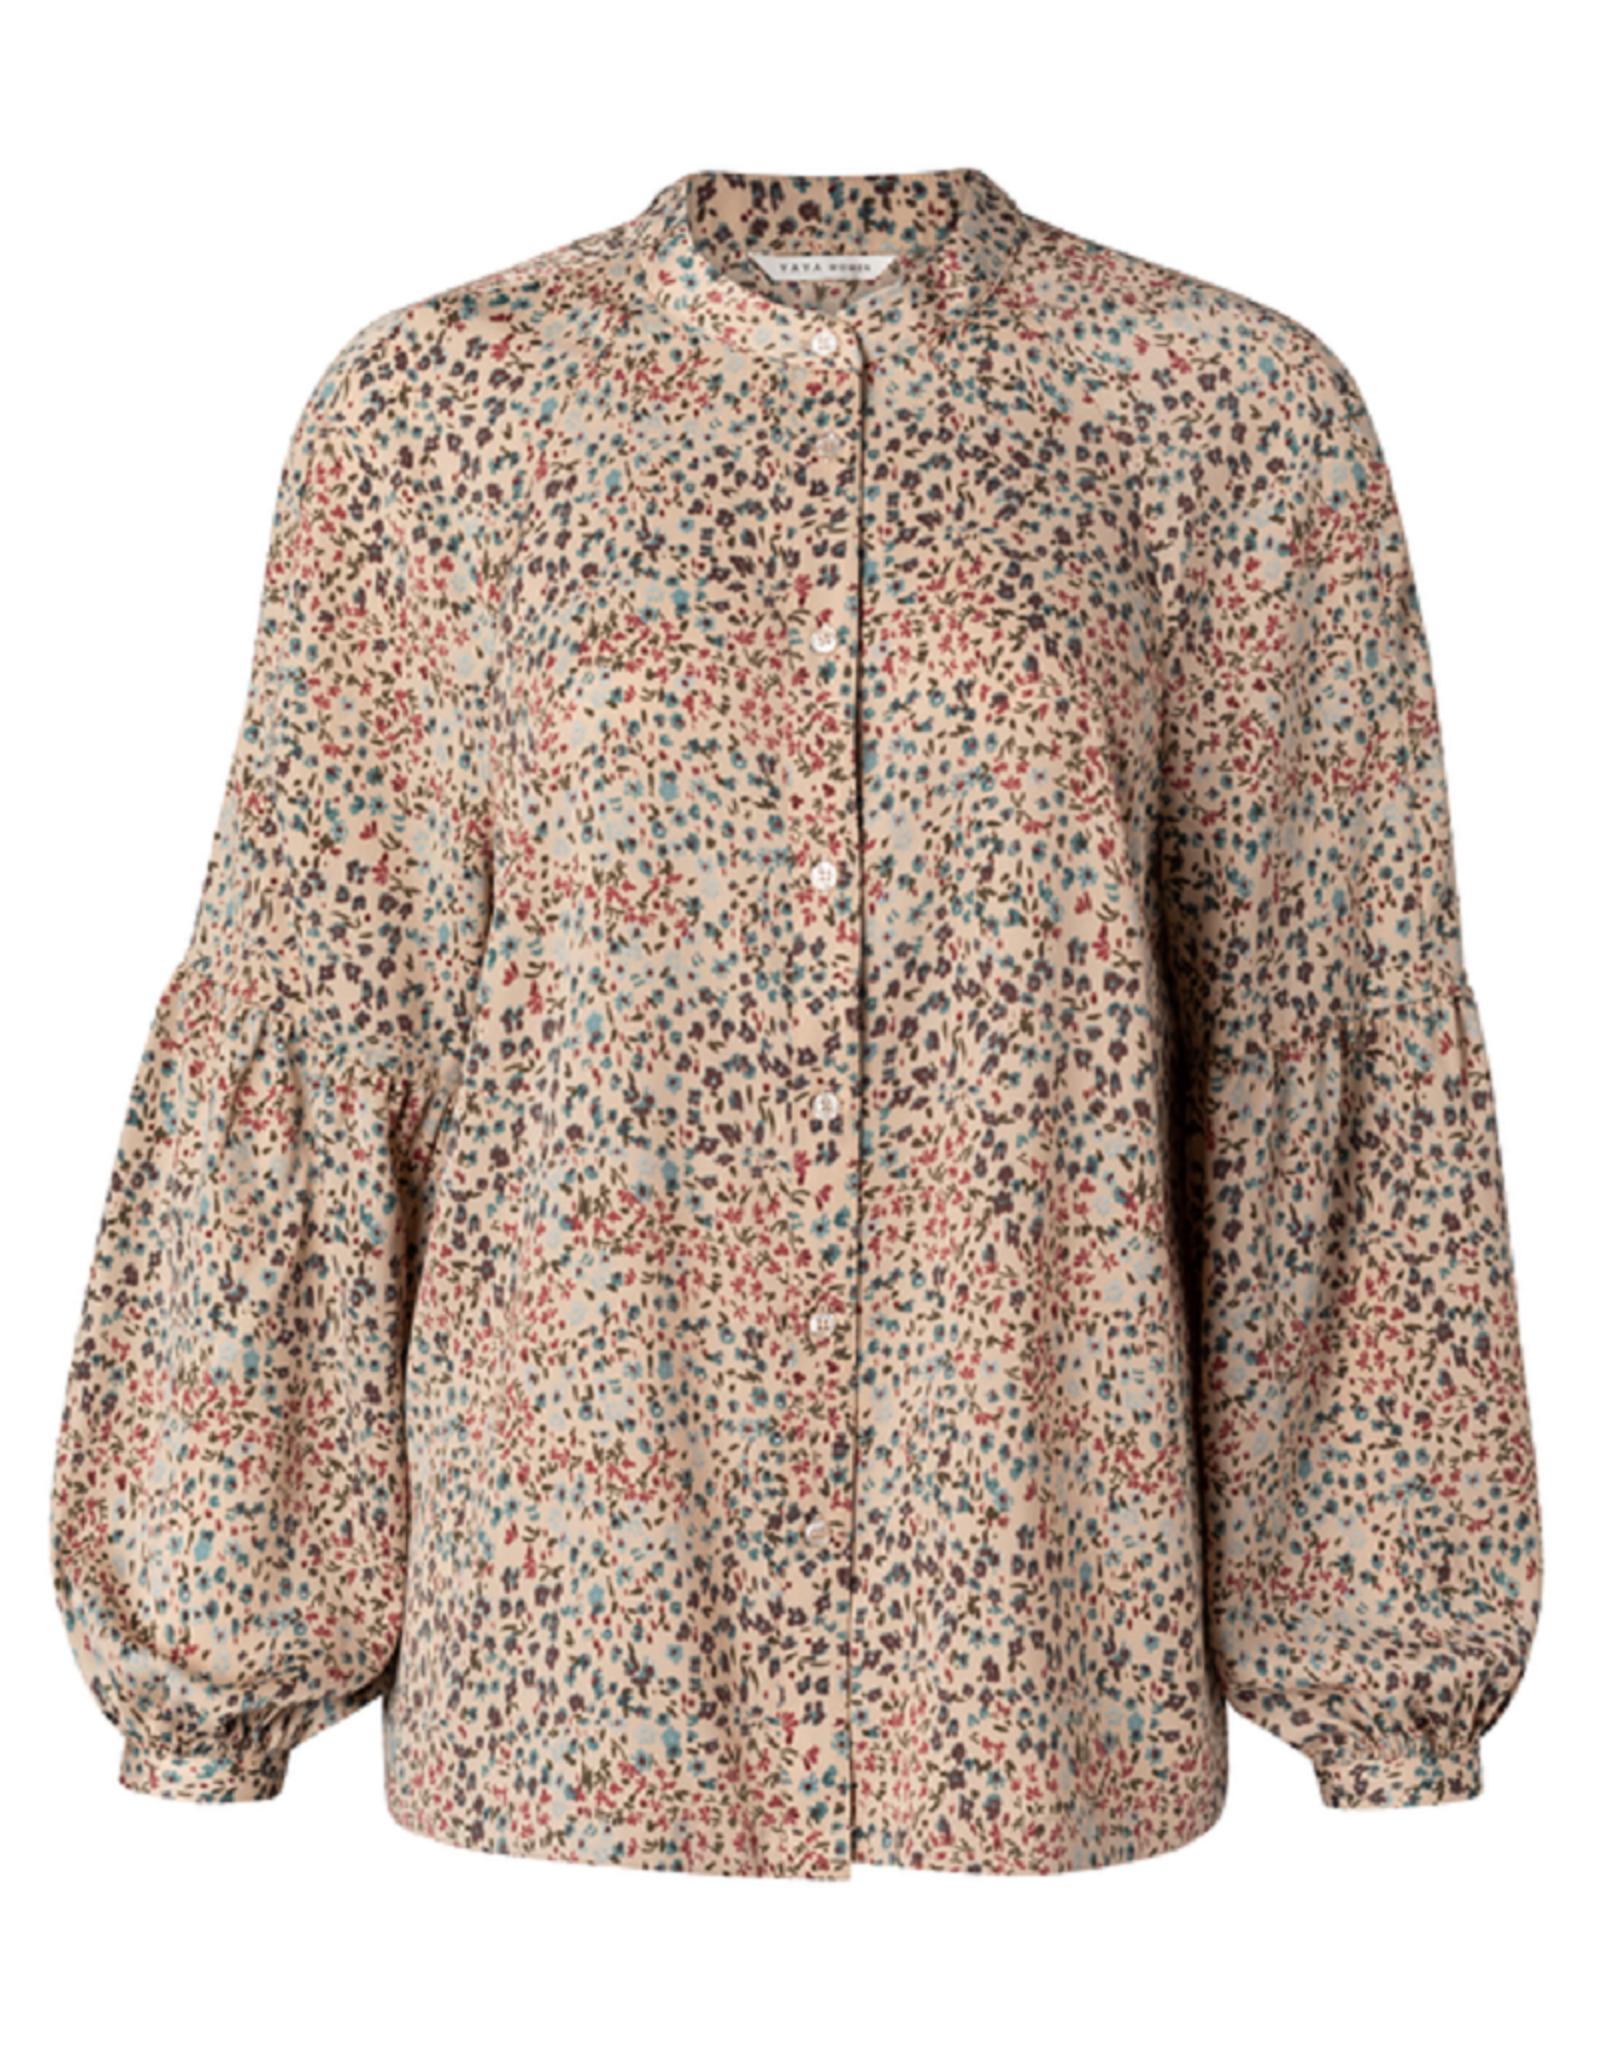 YAYA YAYA Printed puff sleeve blouse sand dessin